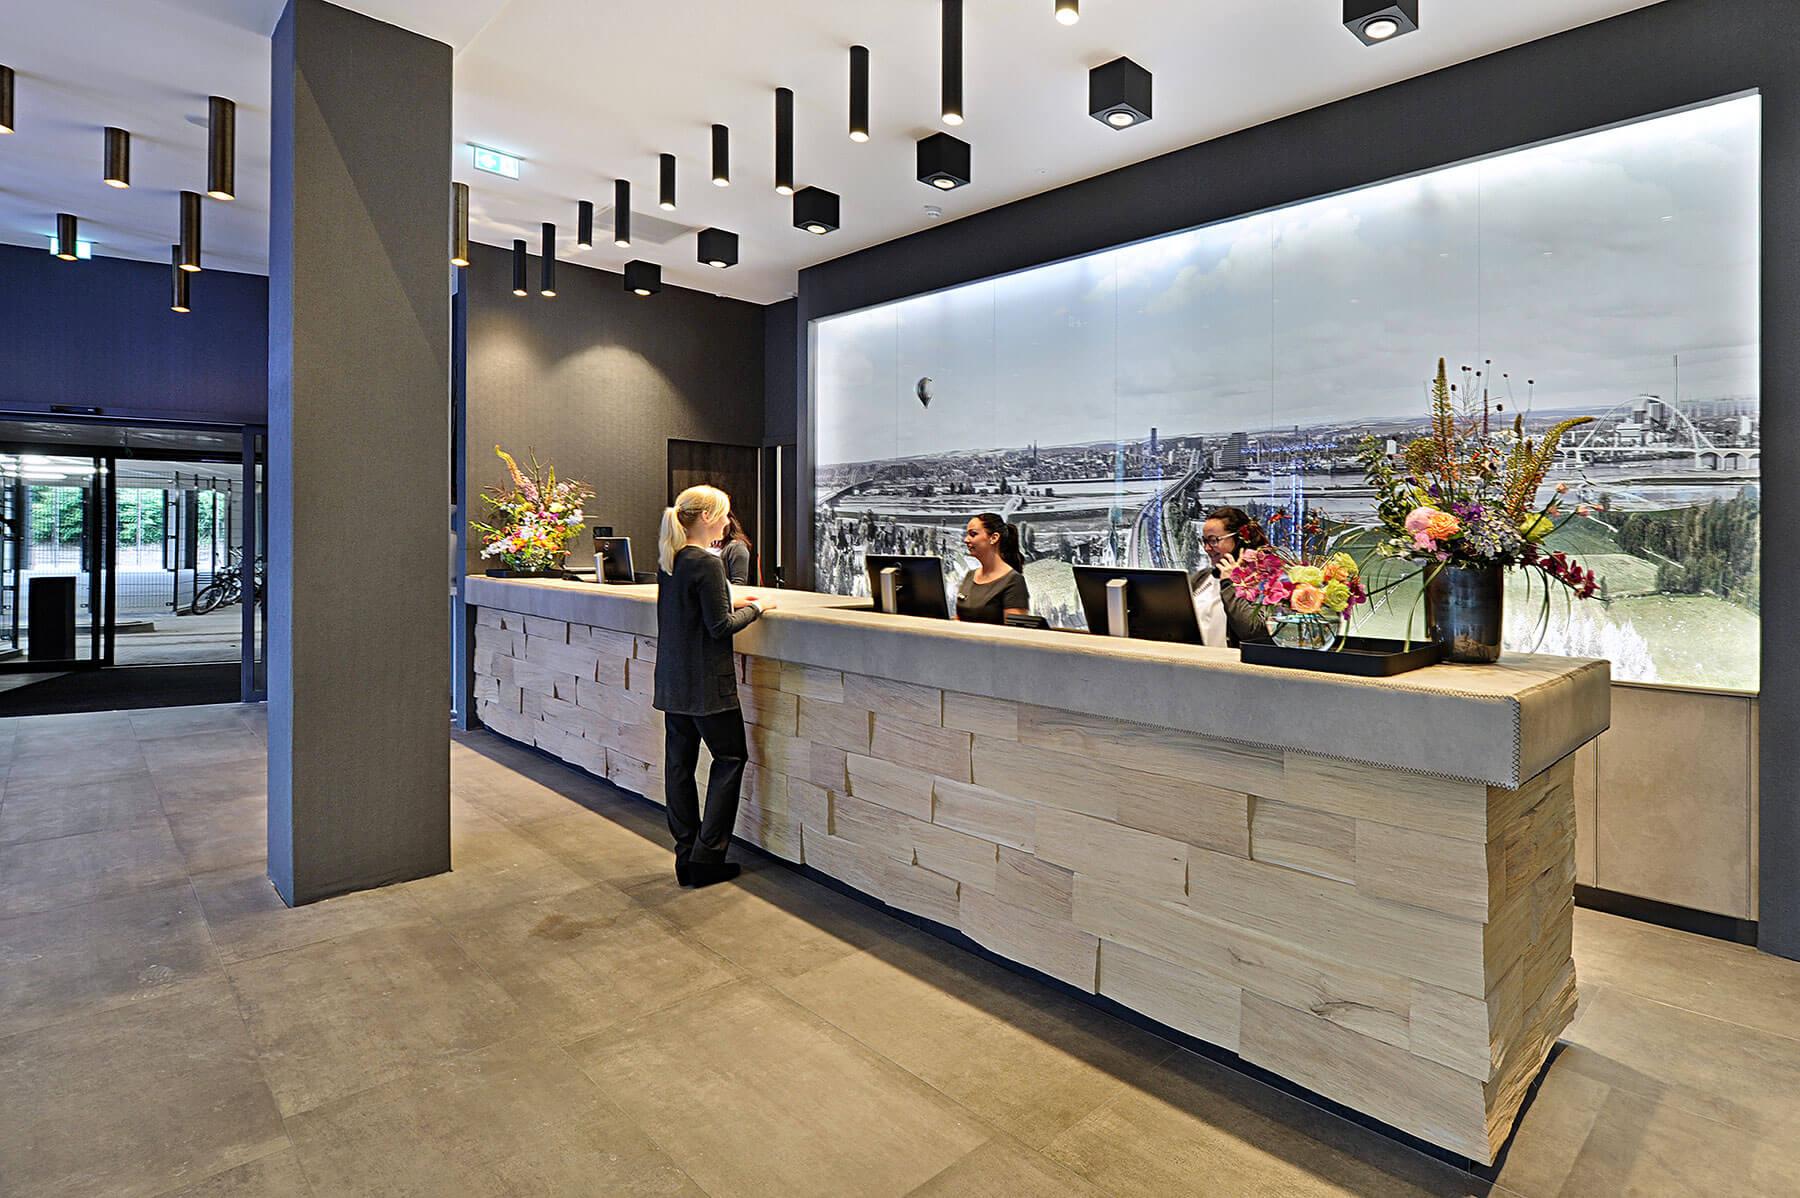 Lobby Van der Valk Hotel Nijmegen-Lent